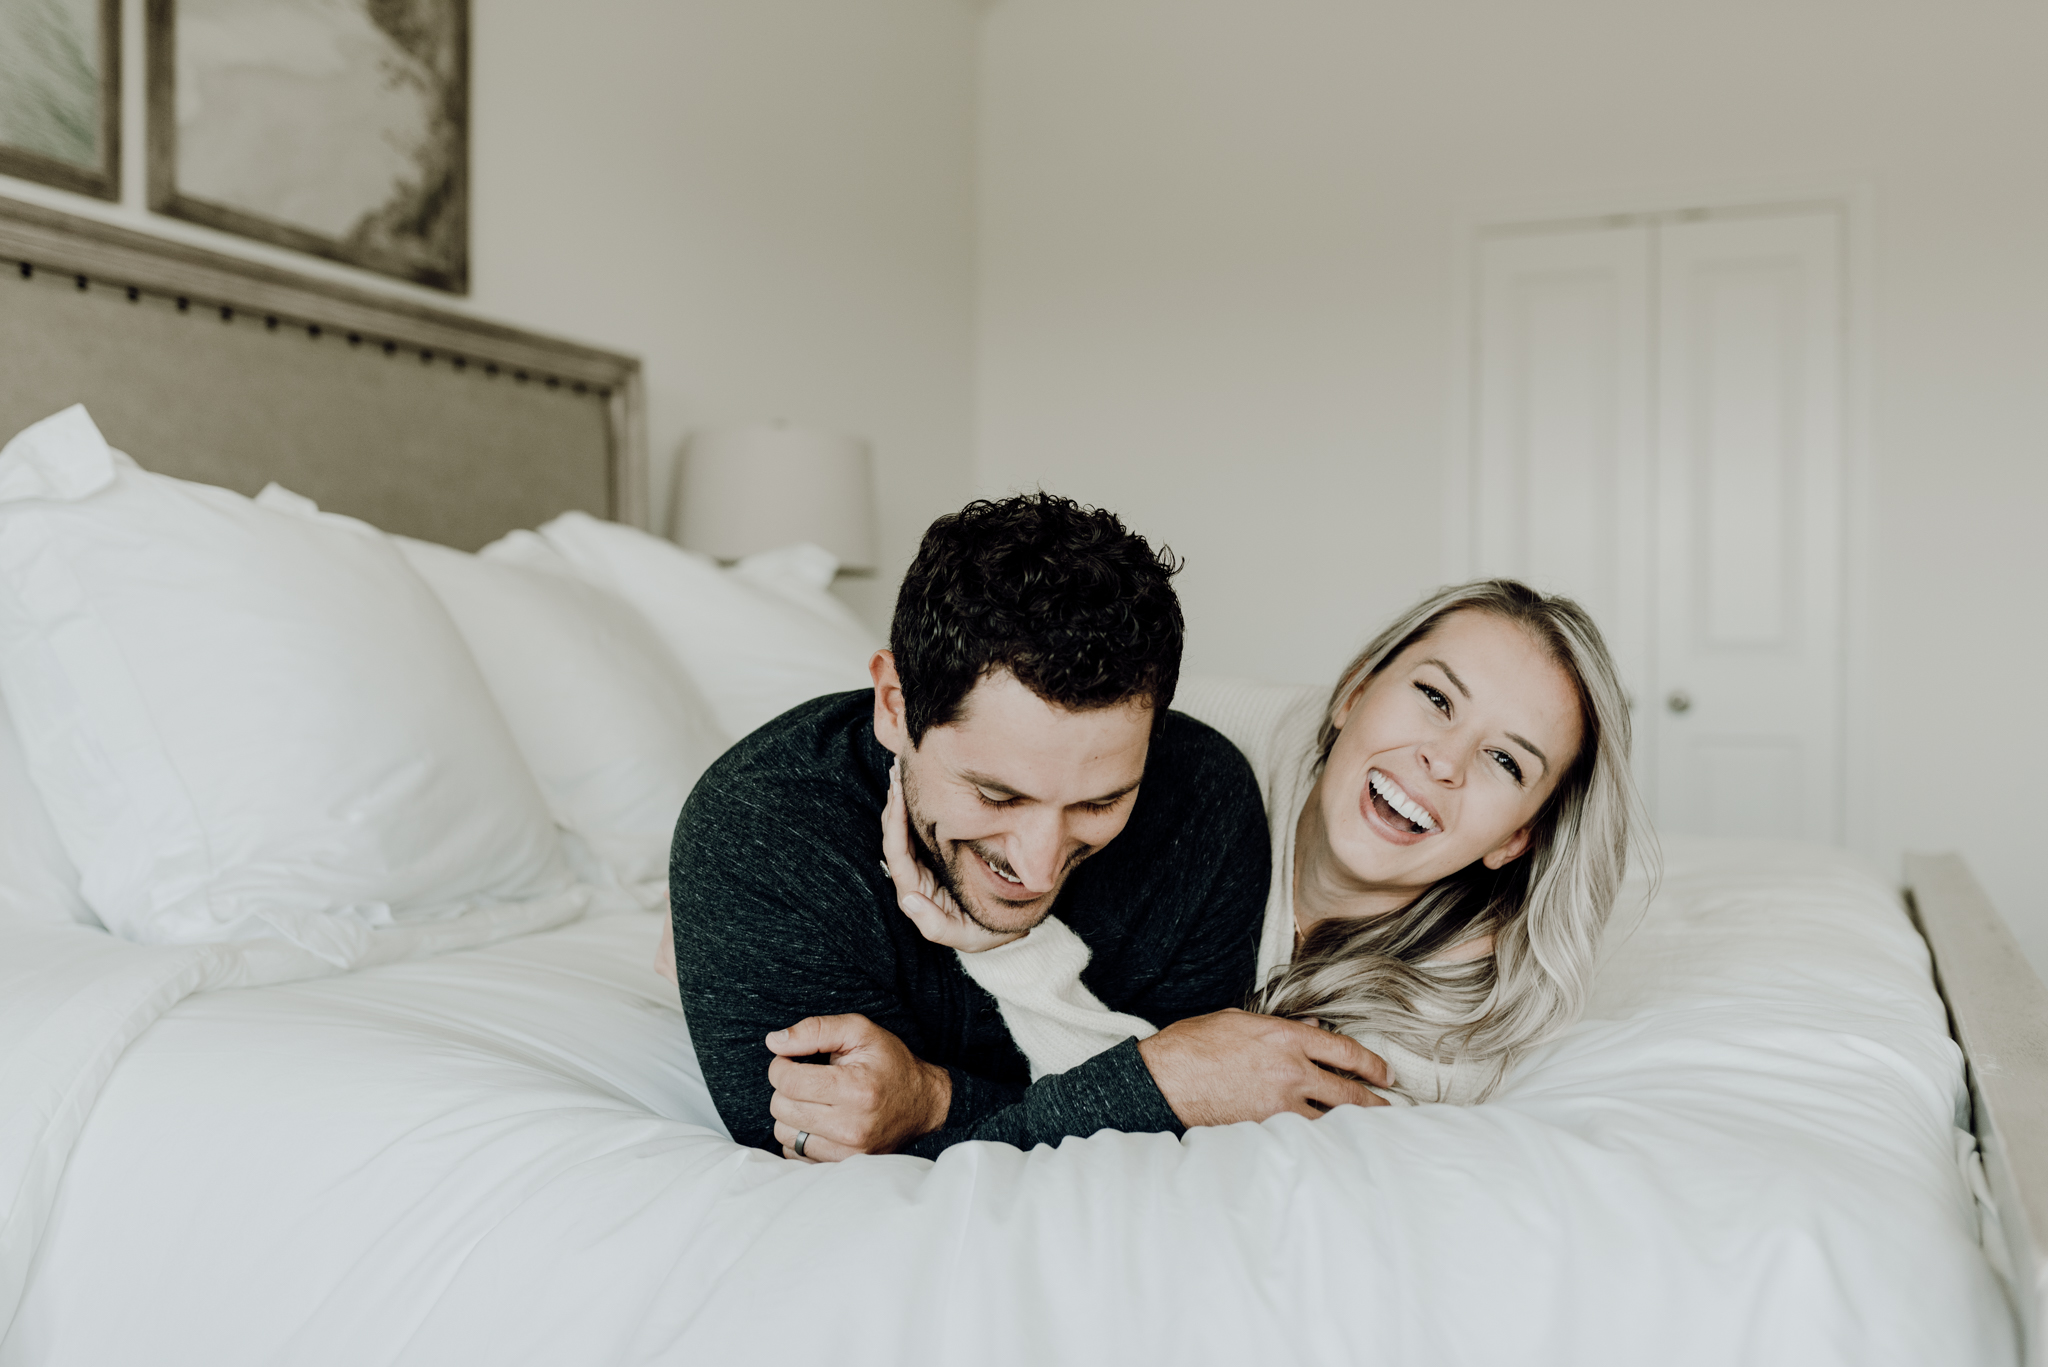 houston-wedding-photographer-in-home-maternity-session-puppies- Houston Wedding Photographer -Kristen Giles Photography-47.jpg